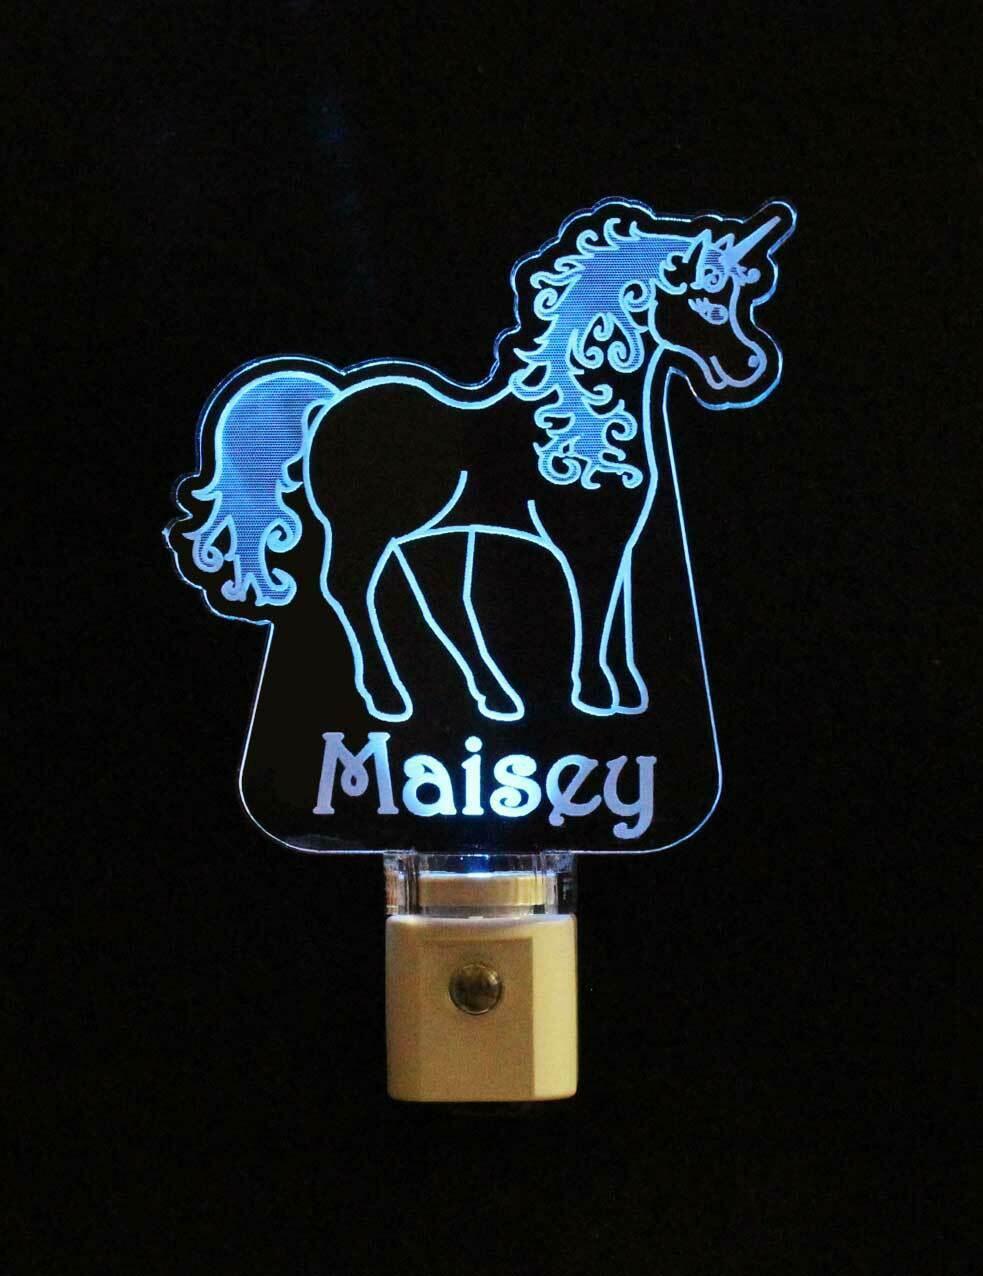 Personalized Unicorn Lamp Night light USB or Wall Plug In image 8